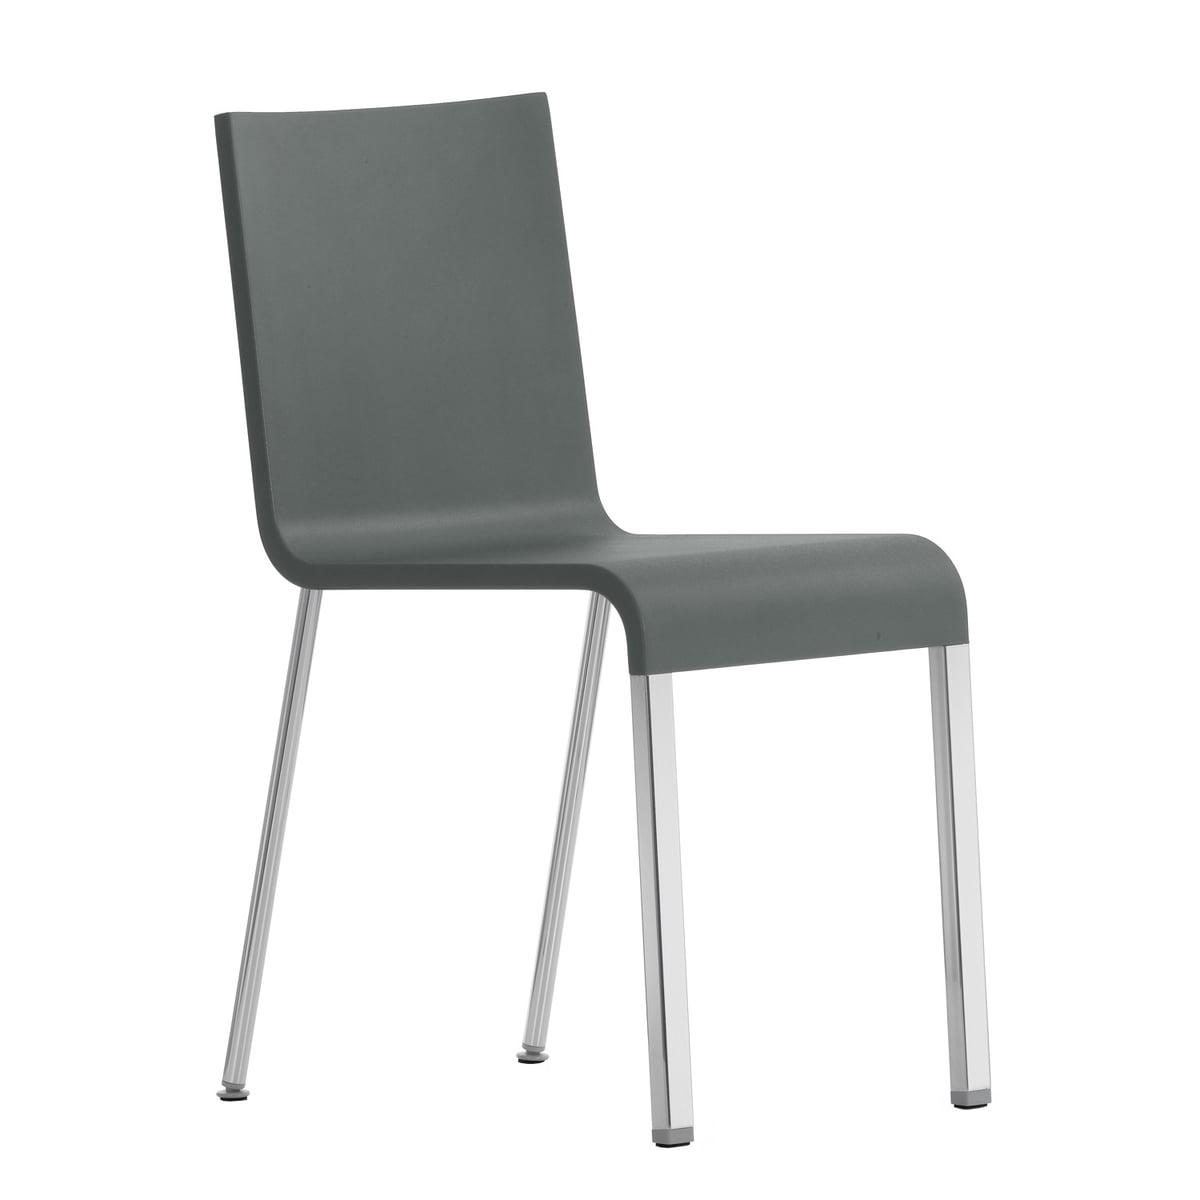 Vitra stuhl 03 im wohndesign shop entdecken - Designer stuhl vitra ...